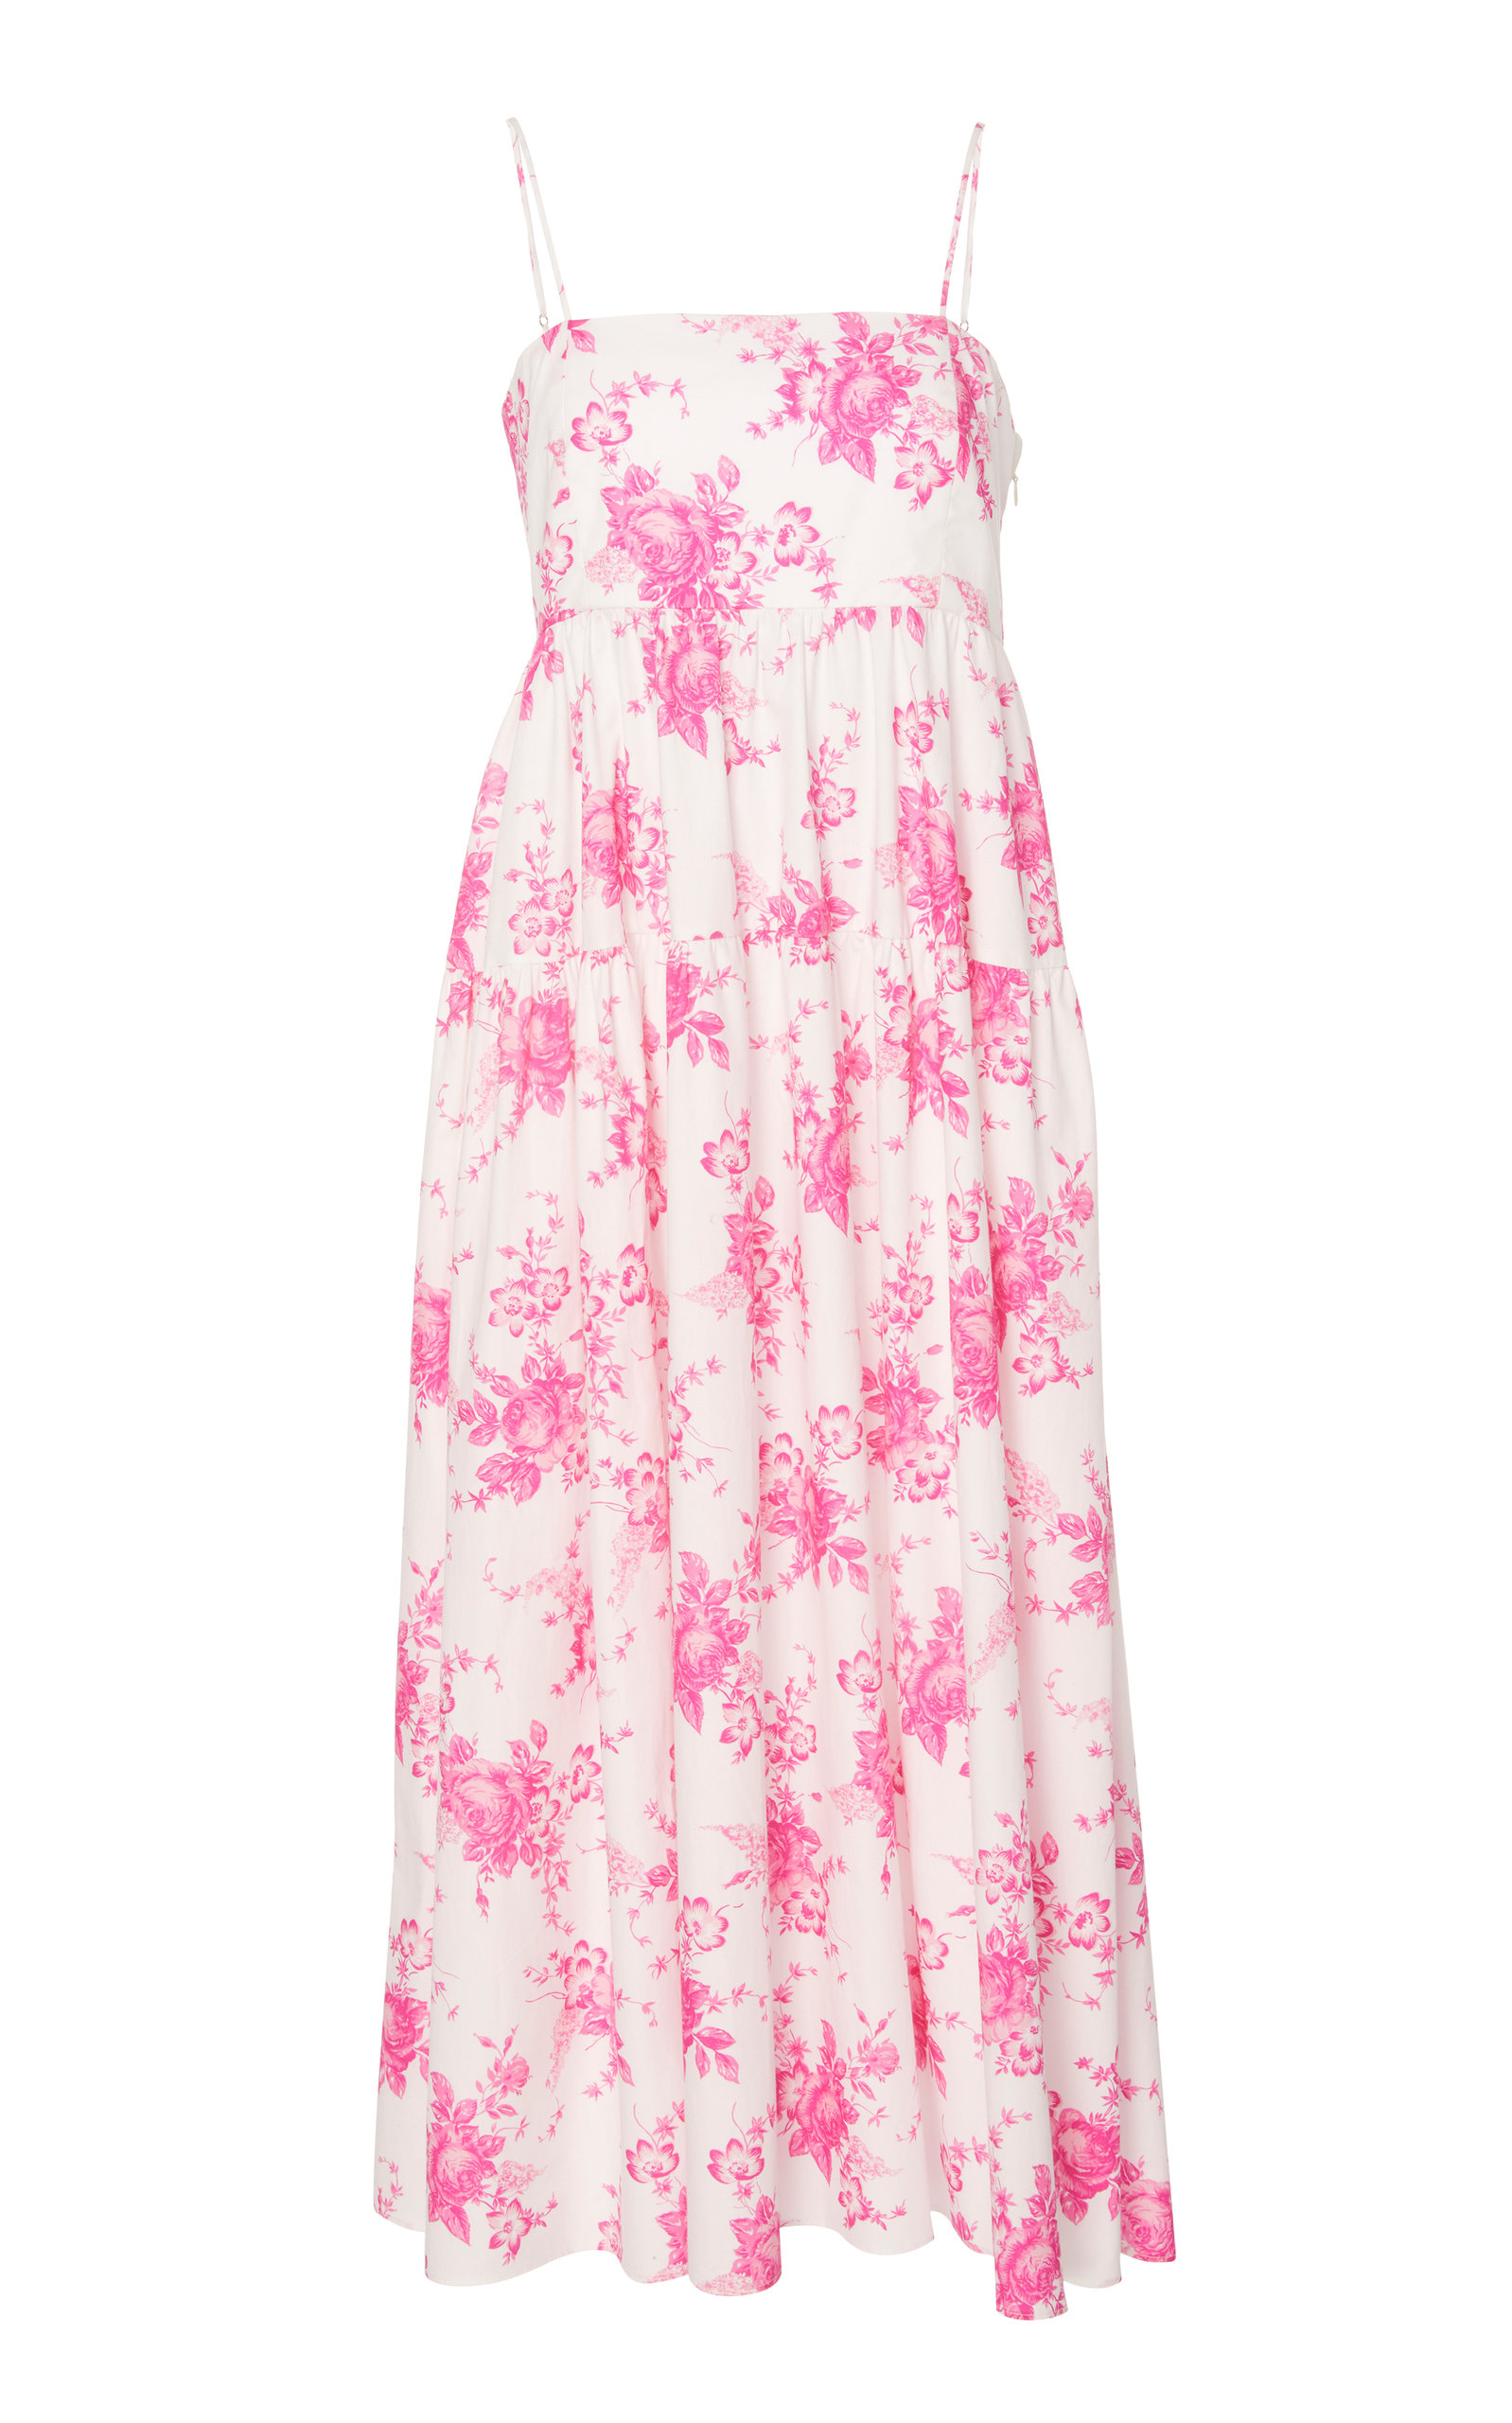 LES RÊVERIES Floral-Print Tiered Sleeveless Poplin Midi Dress in Pink